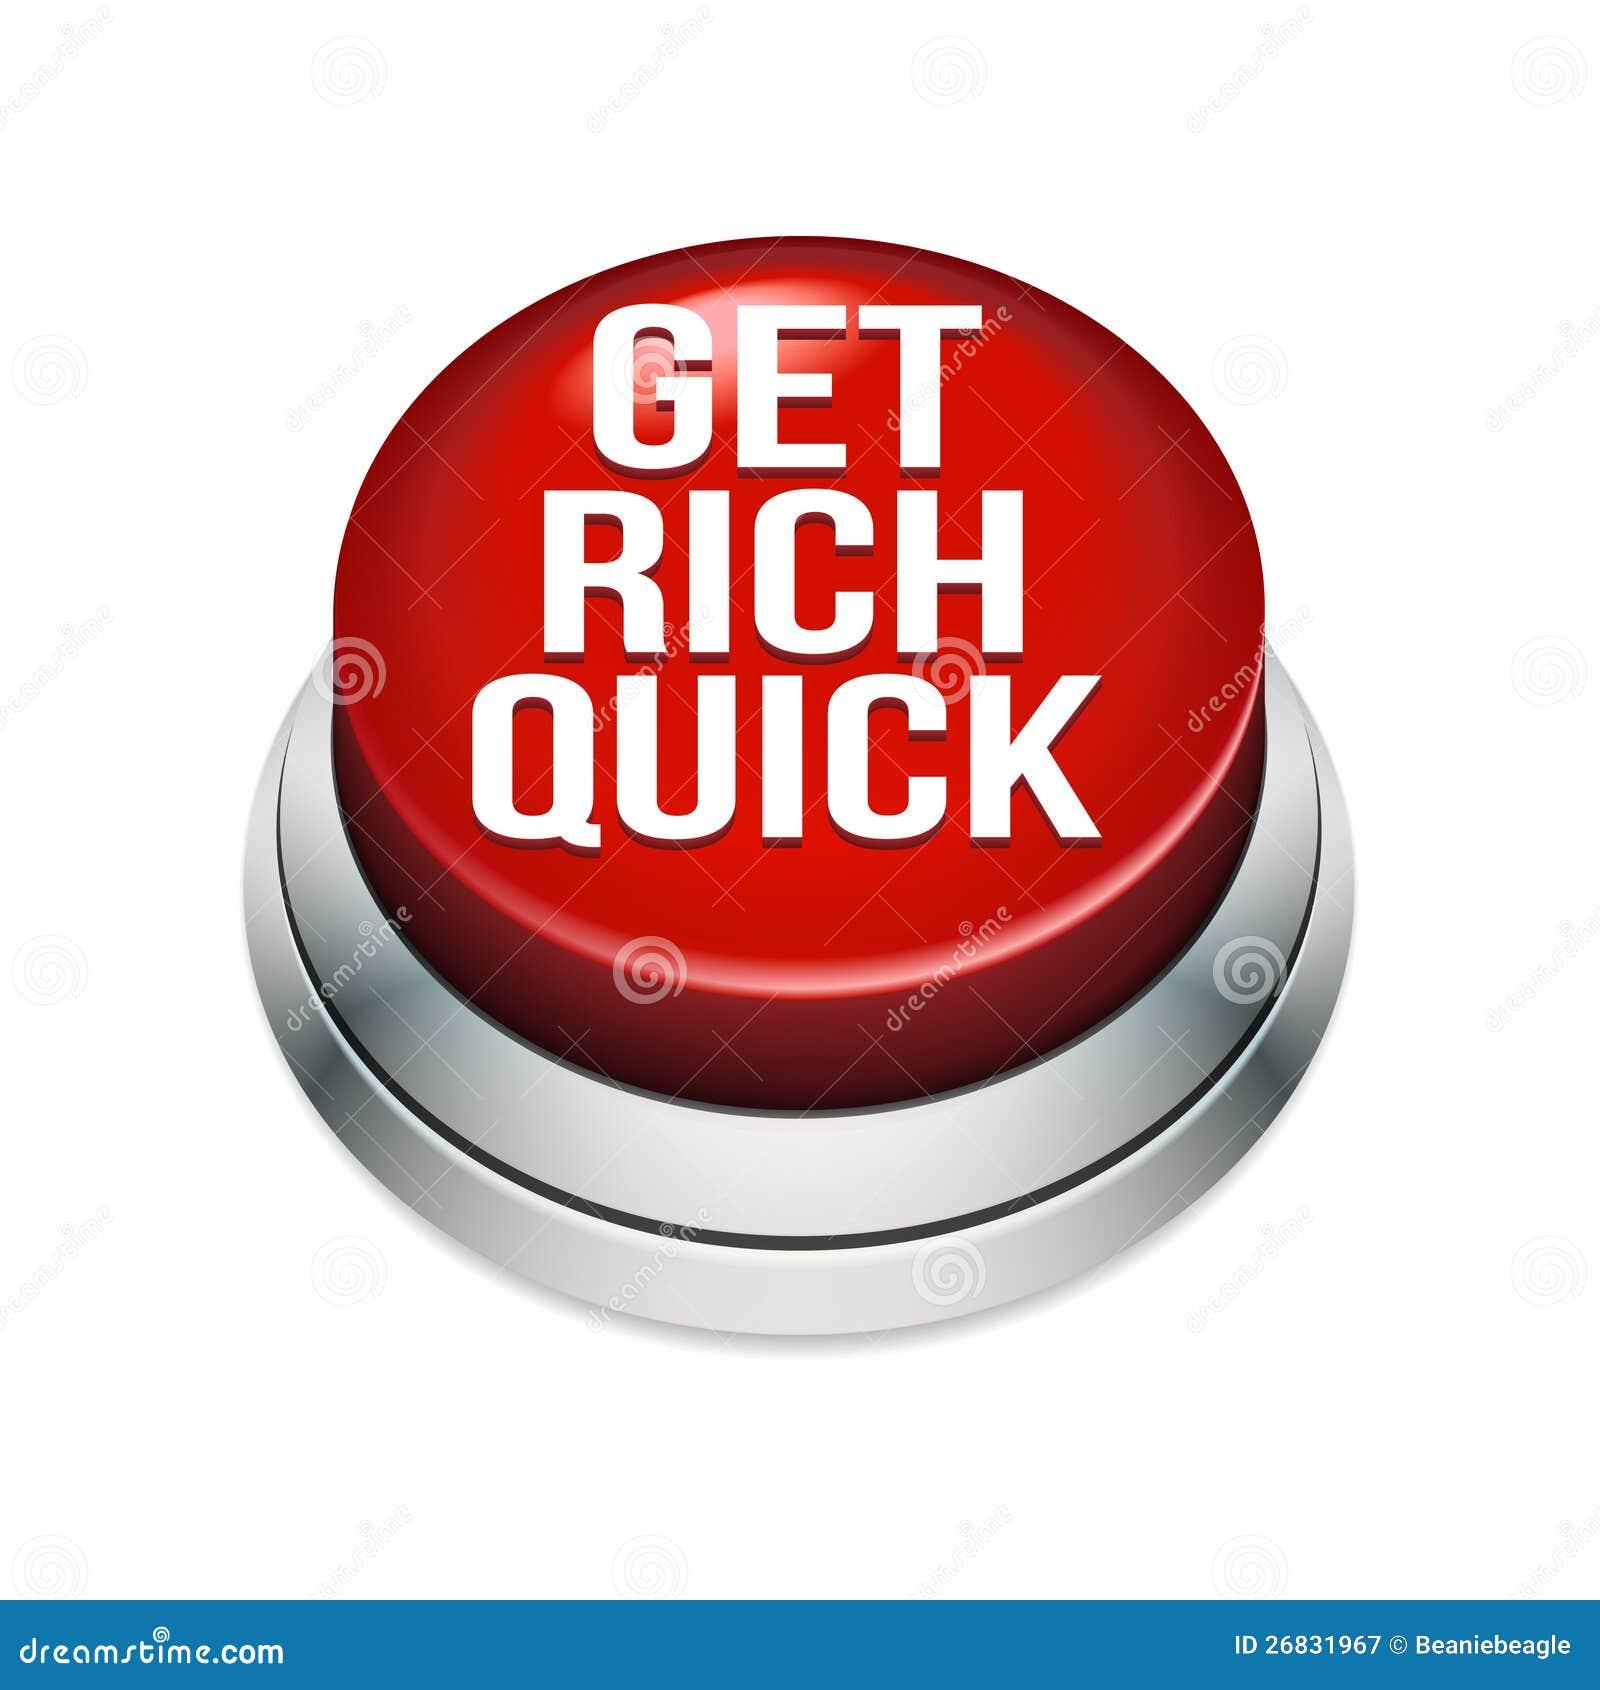 Get Rich Easy